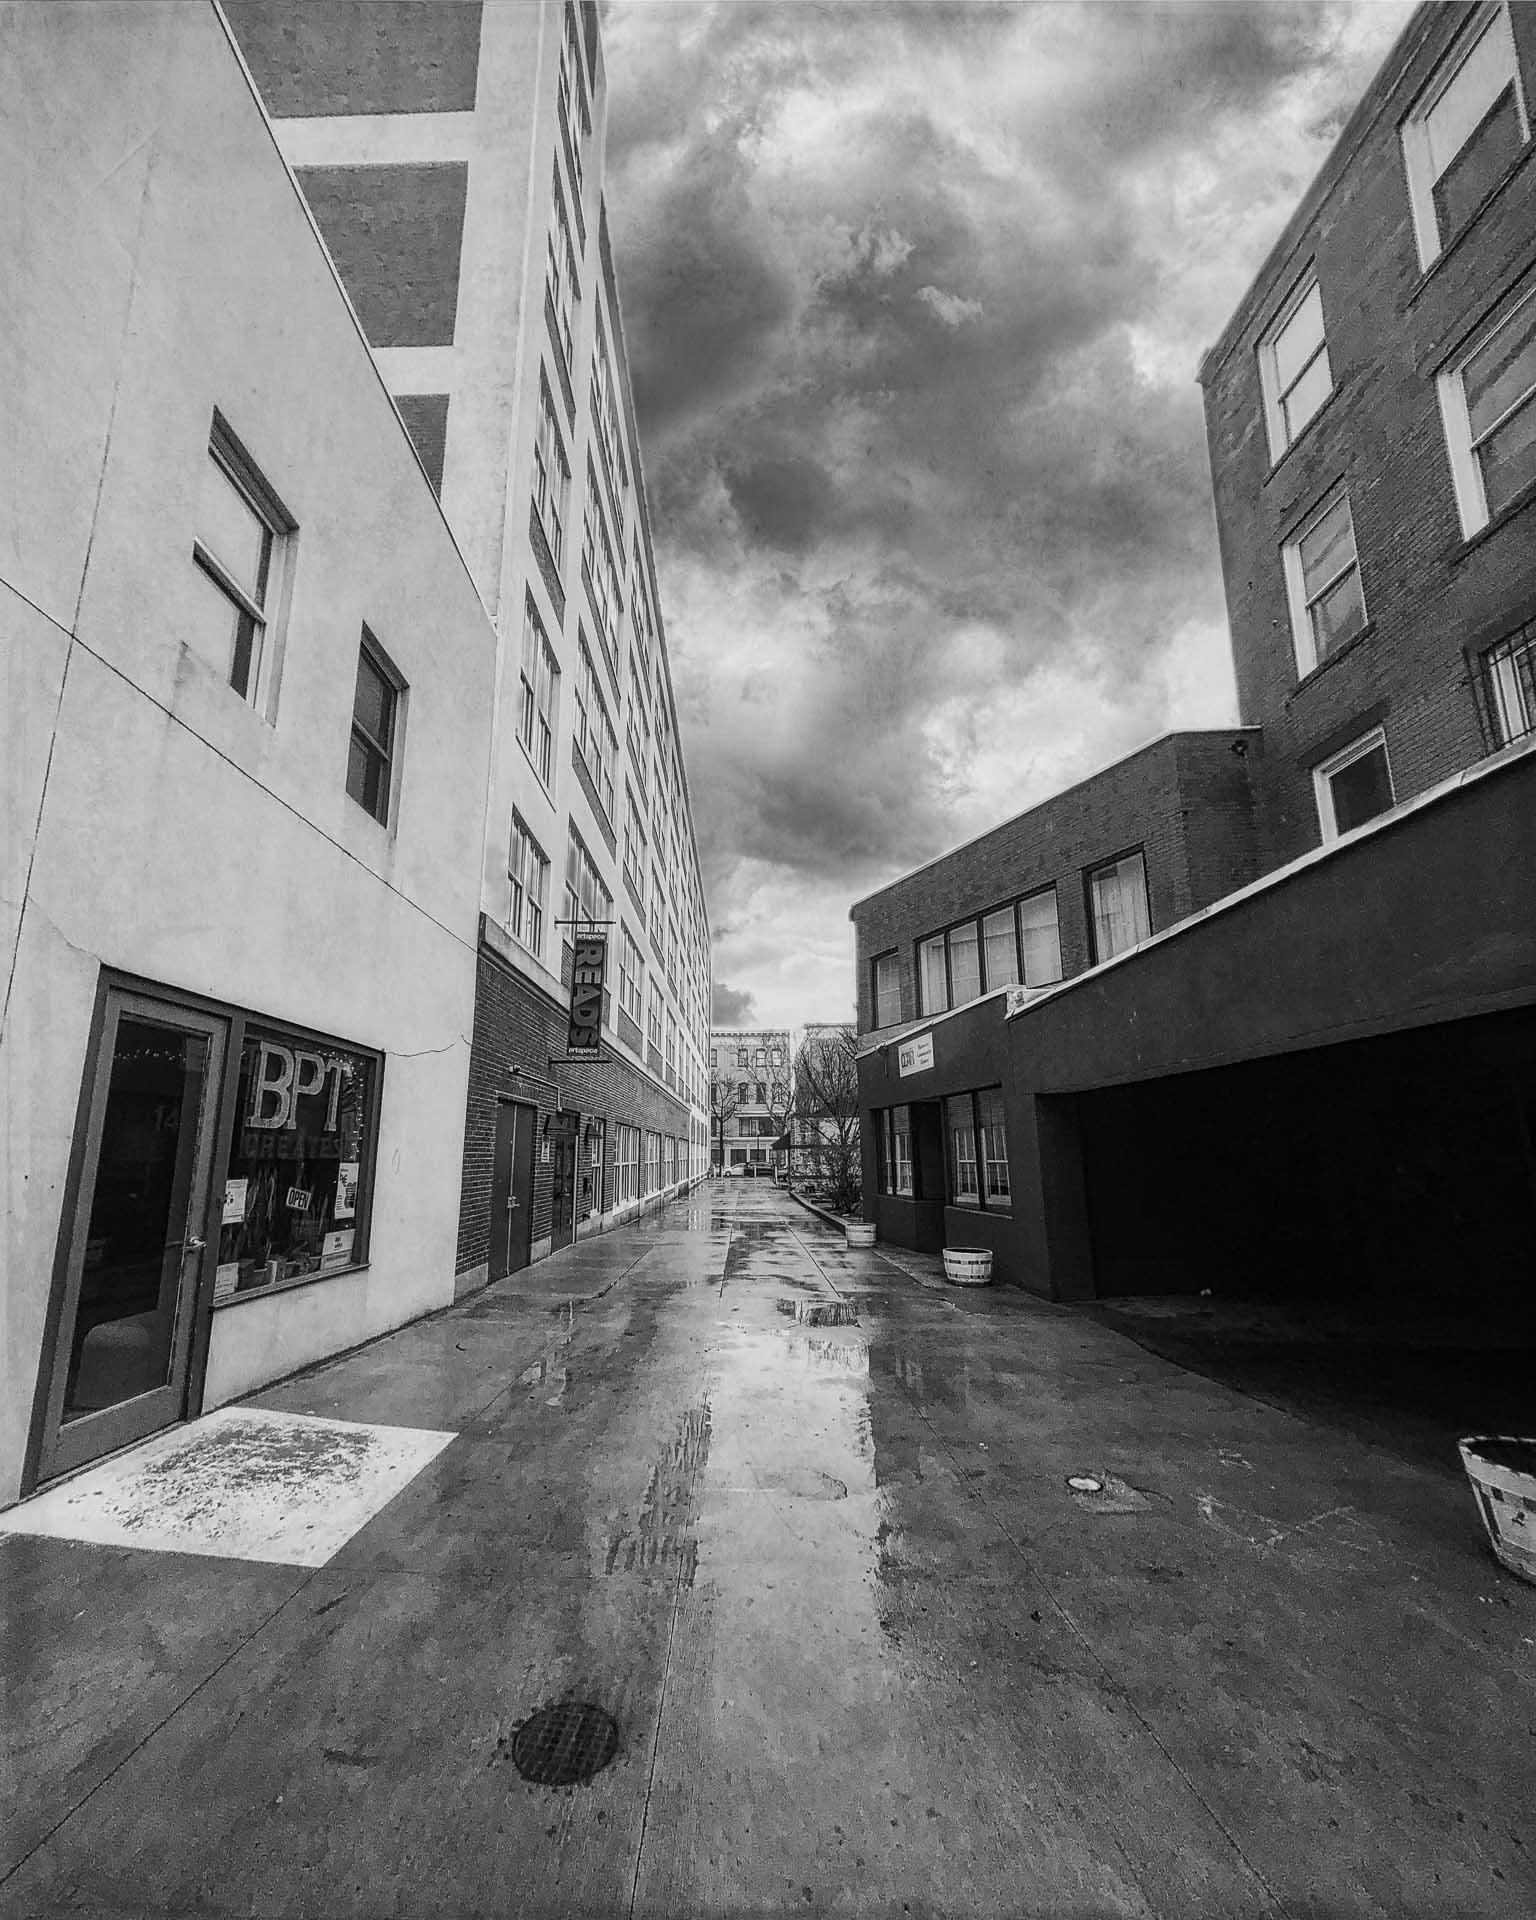 Stormy Alley Website | Instagra - photografia | ello